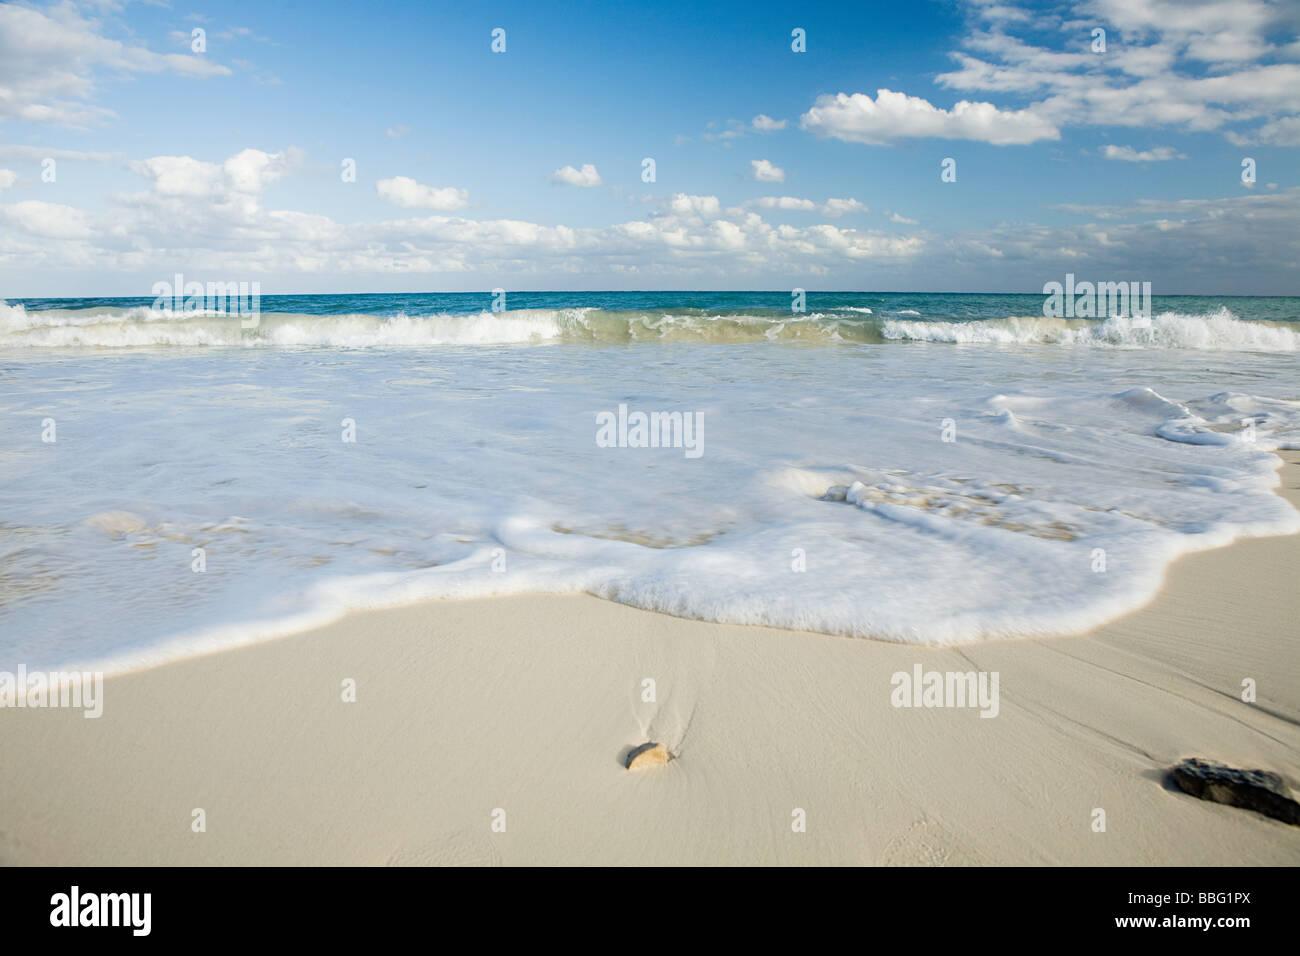 Beach and sea in yucatan - Stock Image